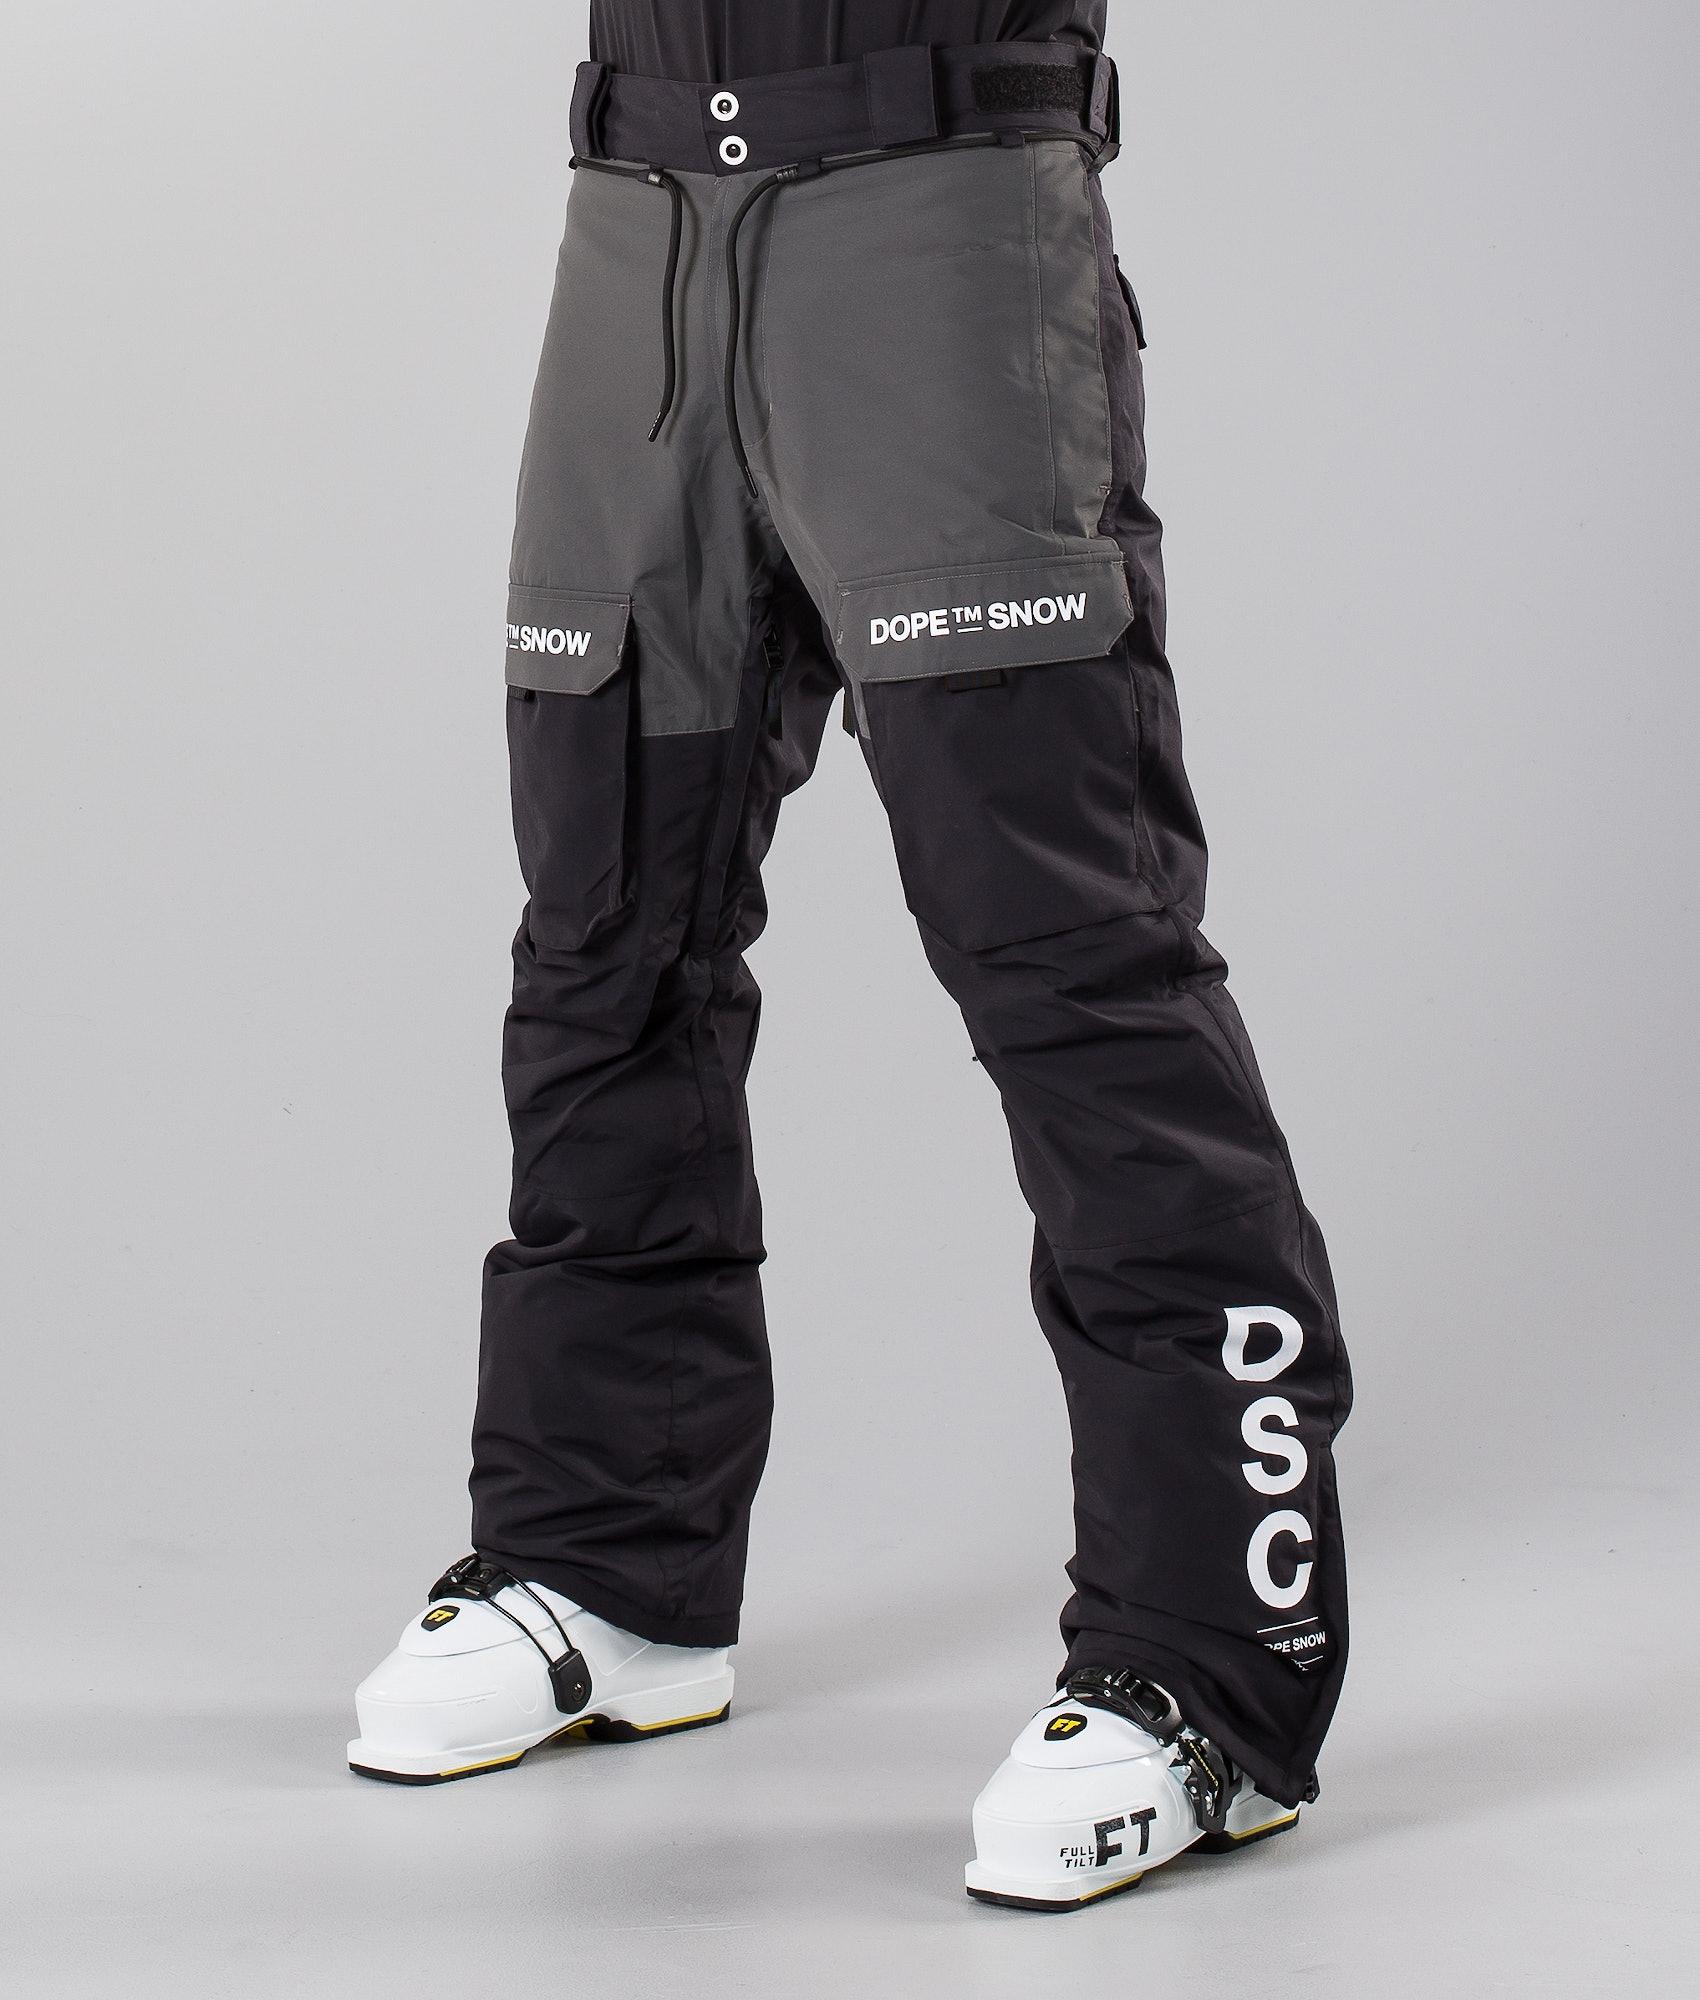 39e22ca8bd0 Dope Poise DSC Ski Pants Black Dark Grey II - Ridestore.com